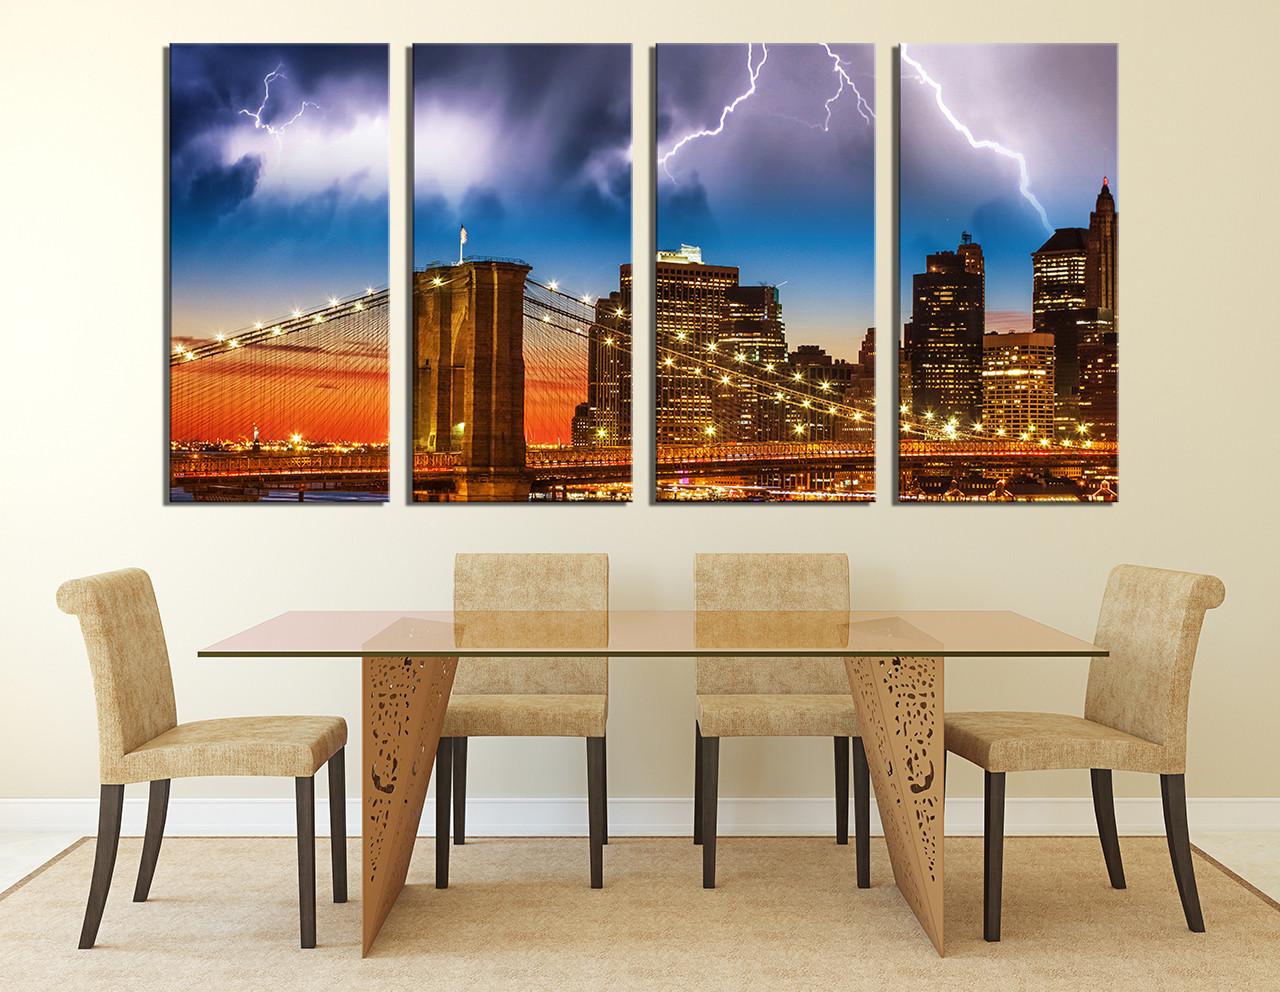 4 piece wall decor city multi panel art brown canvas print thunderstorm photo & 4 Piece Canvas Art Prints Brown Canvas Wall Art Cityscape Multi ...